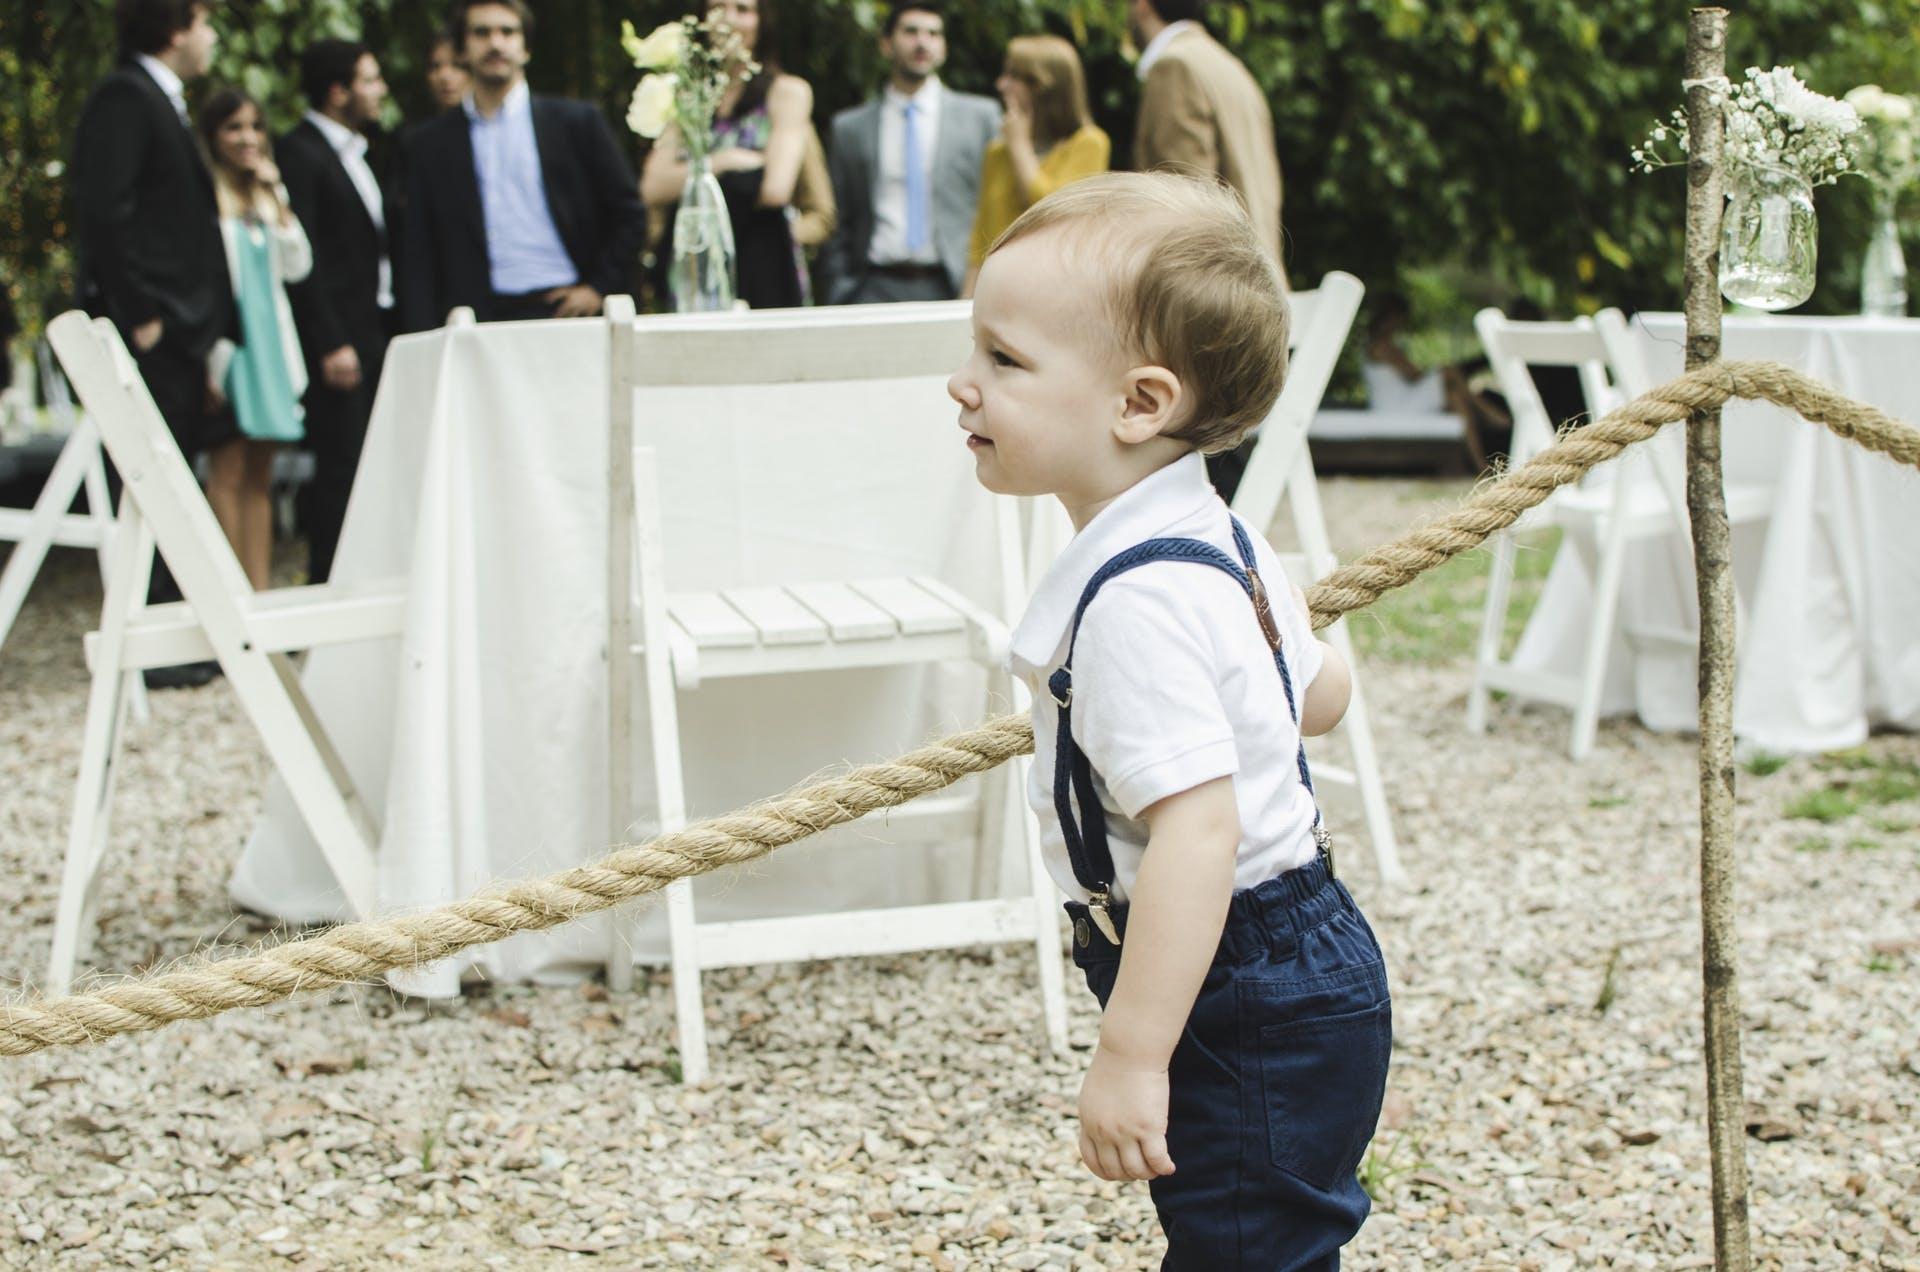 child wedding party baby boy garden outdoor wedding party